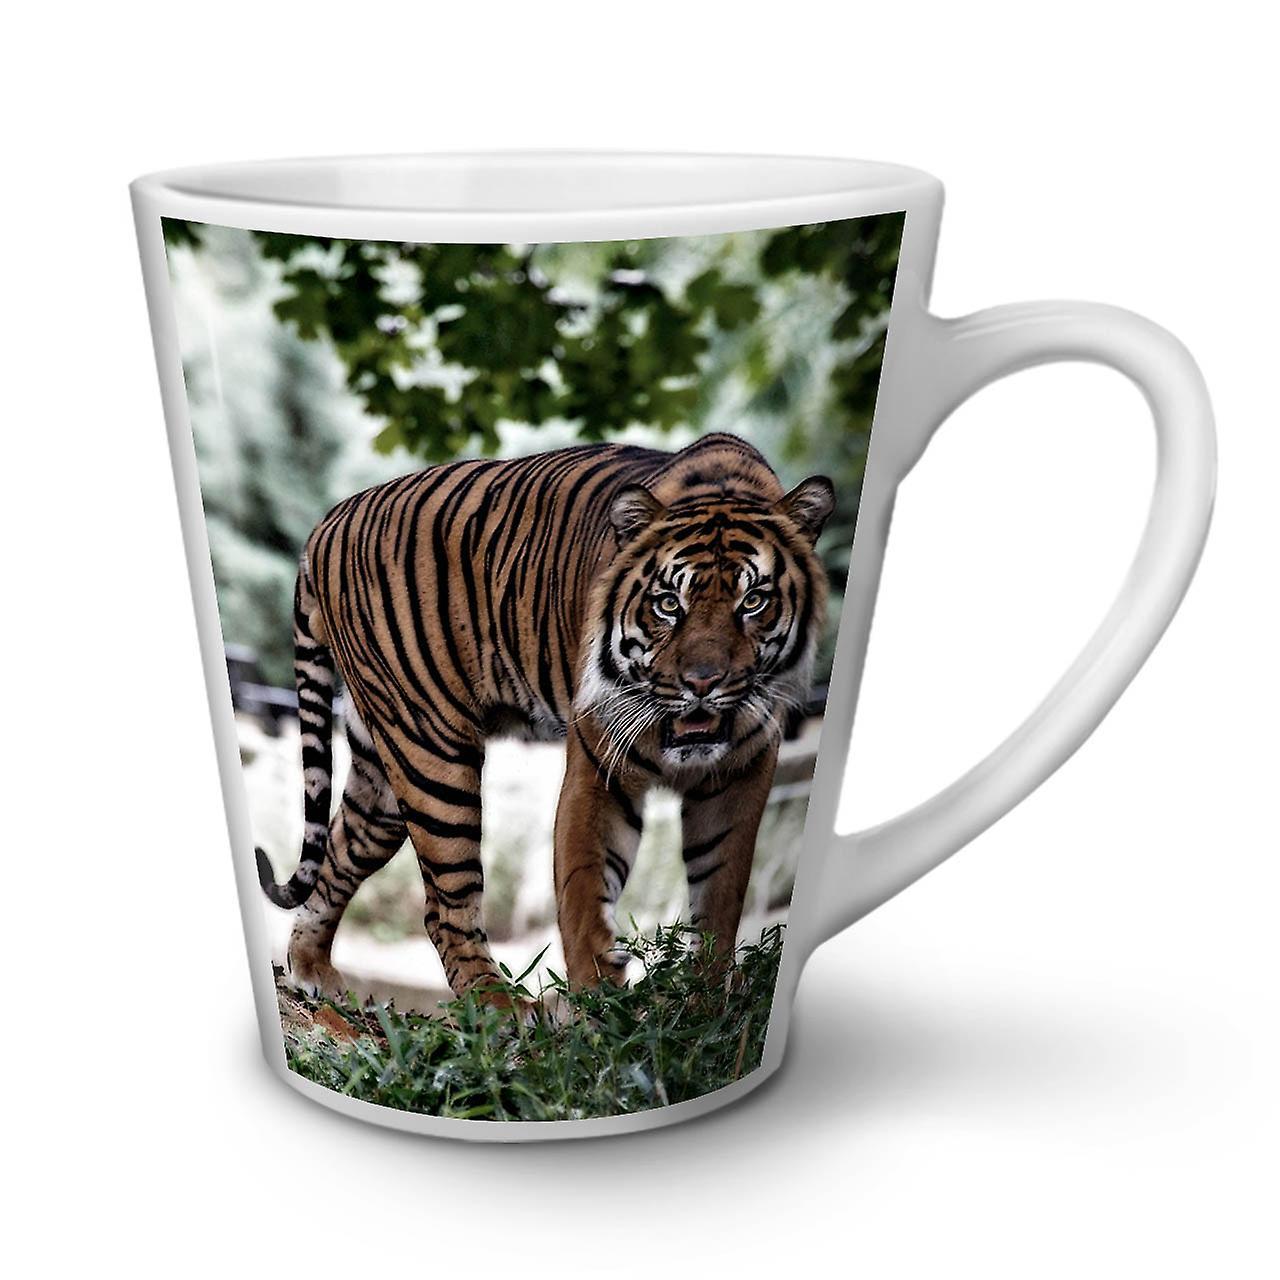 Sauvage Blanche Tigre Nature Latte Céramique Nouvelle OzWellcoda 12 Café Tasse En vNmOnw80